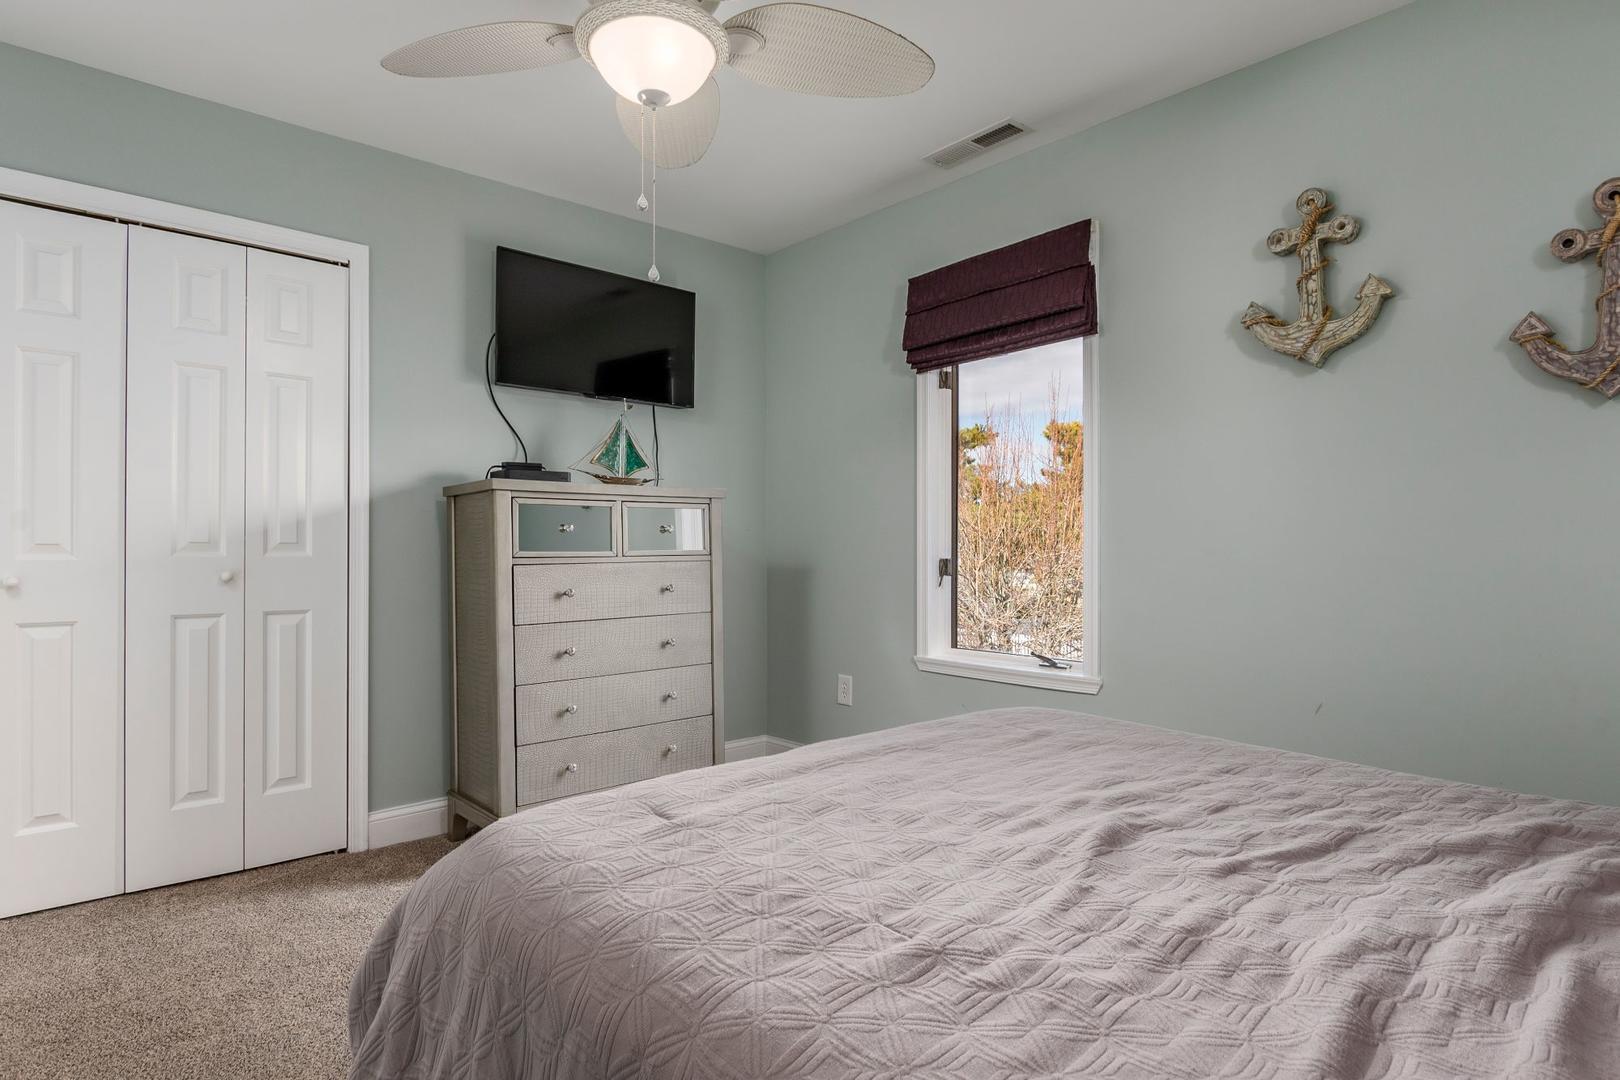 Channel Buoy Retreat - Bedroom 2